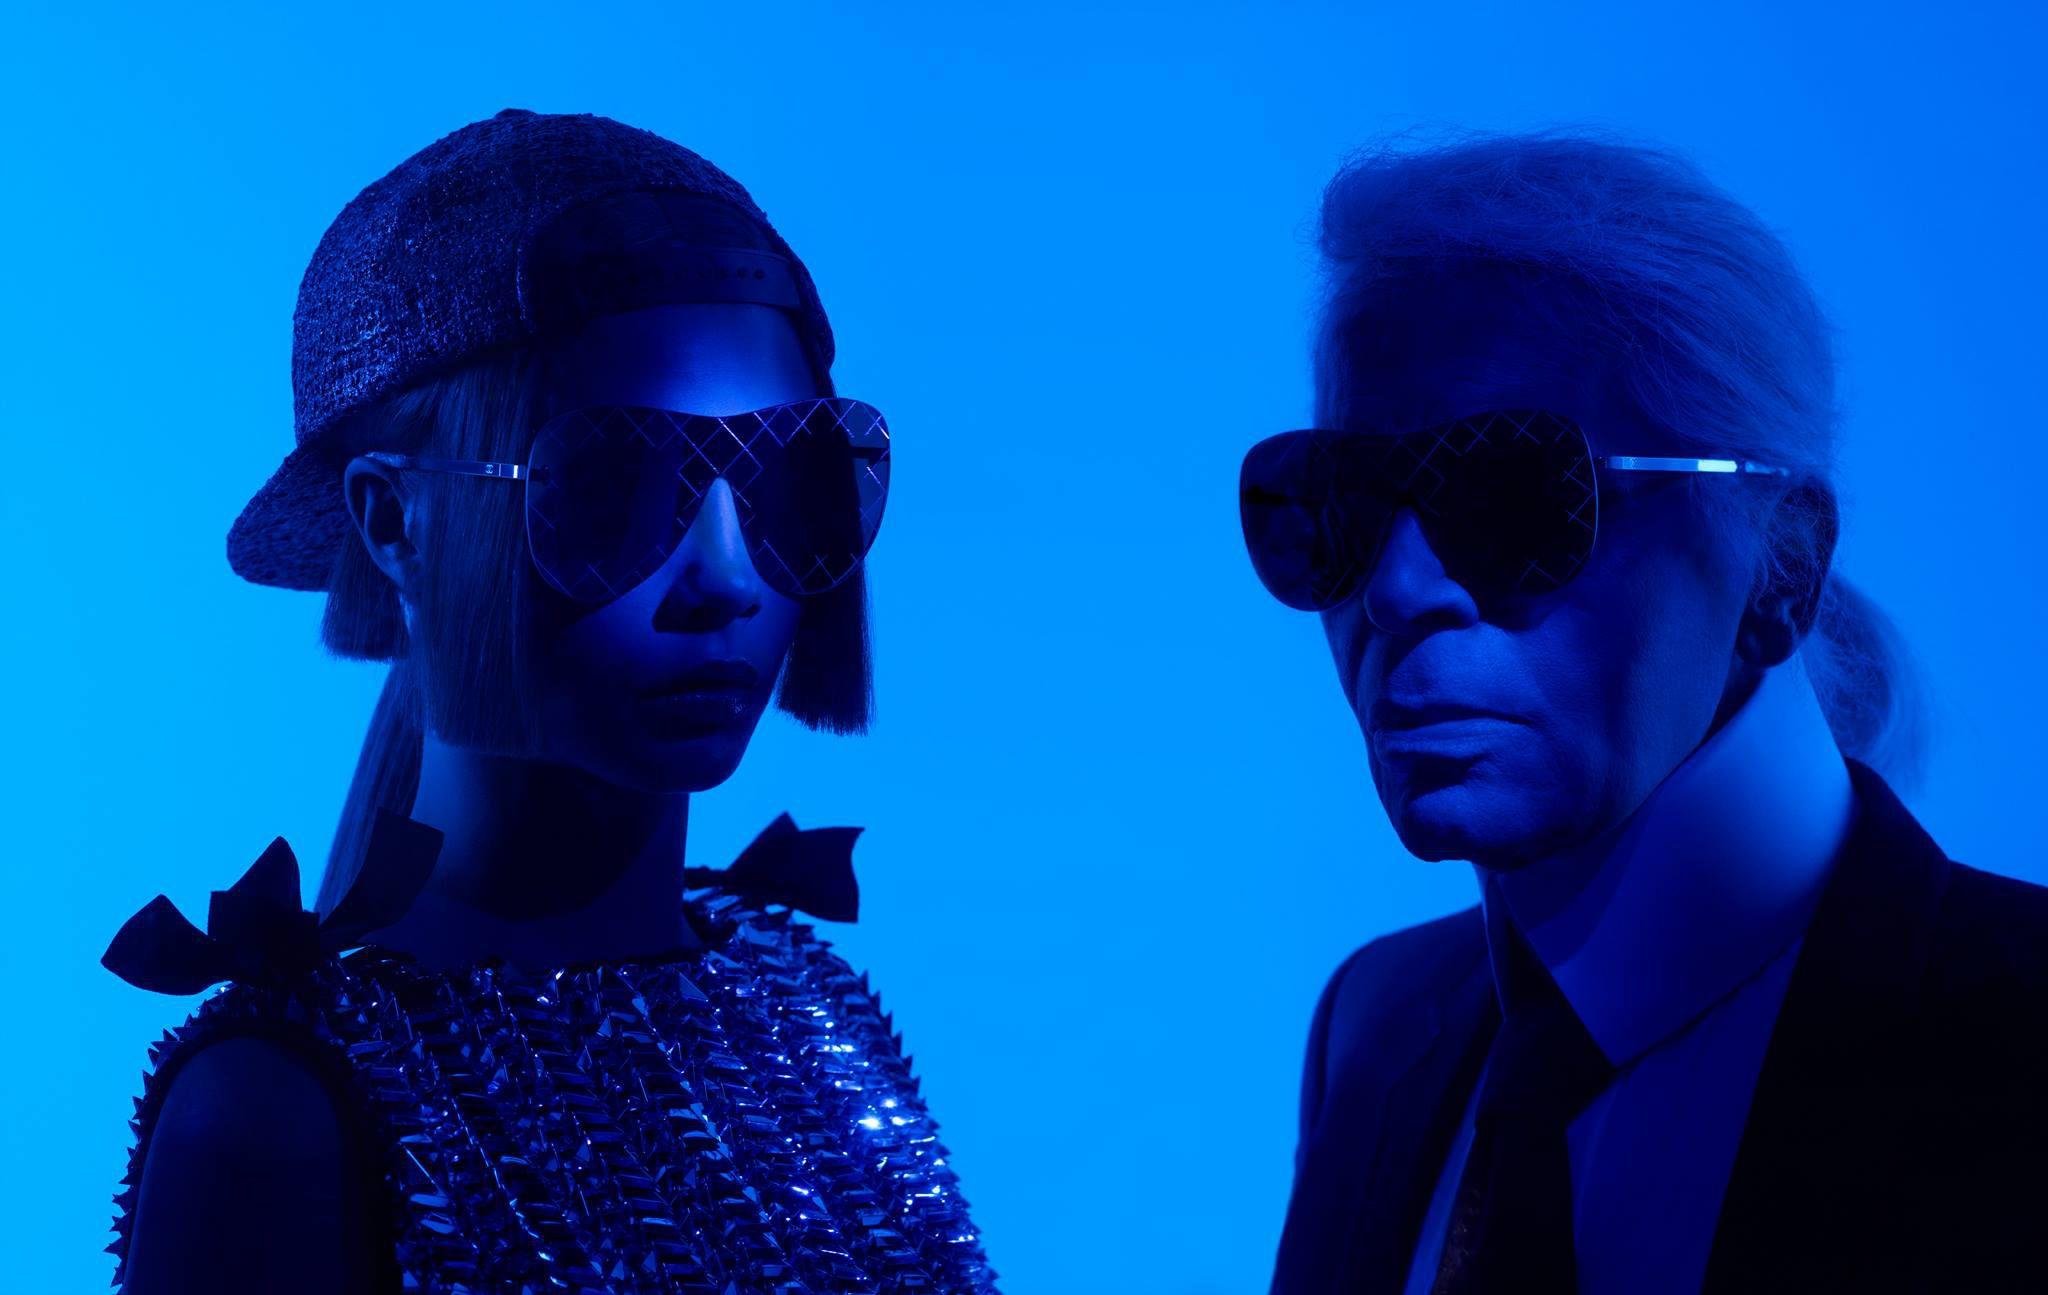 Tko je novo lice Chanel naočala?